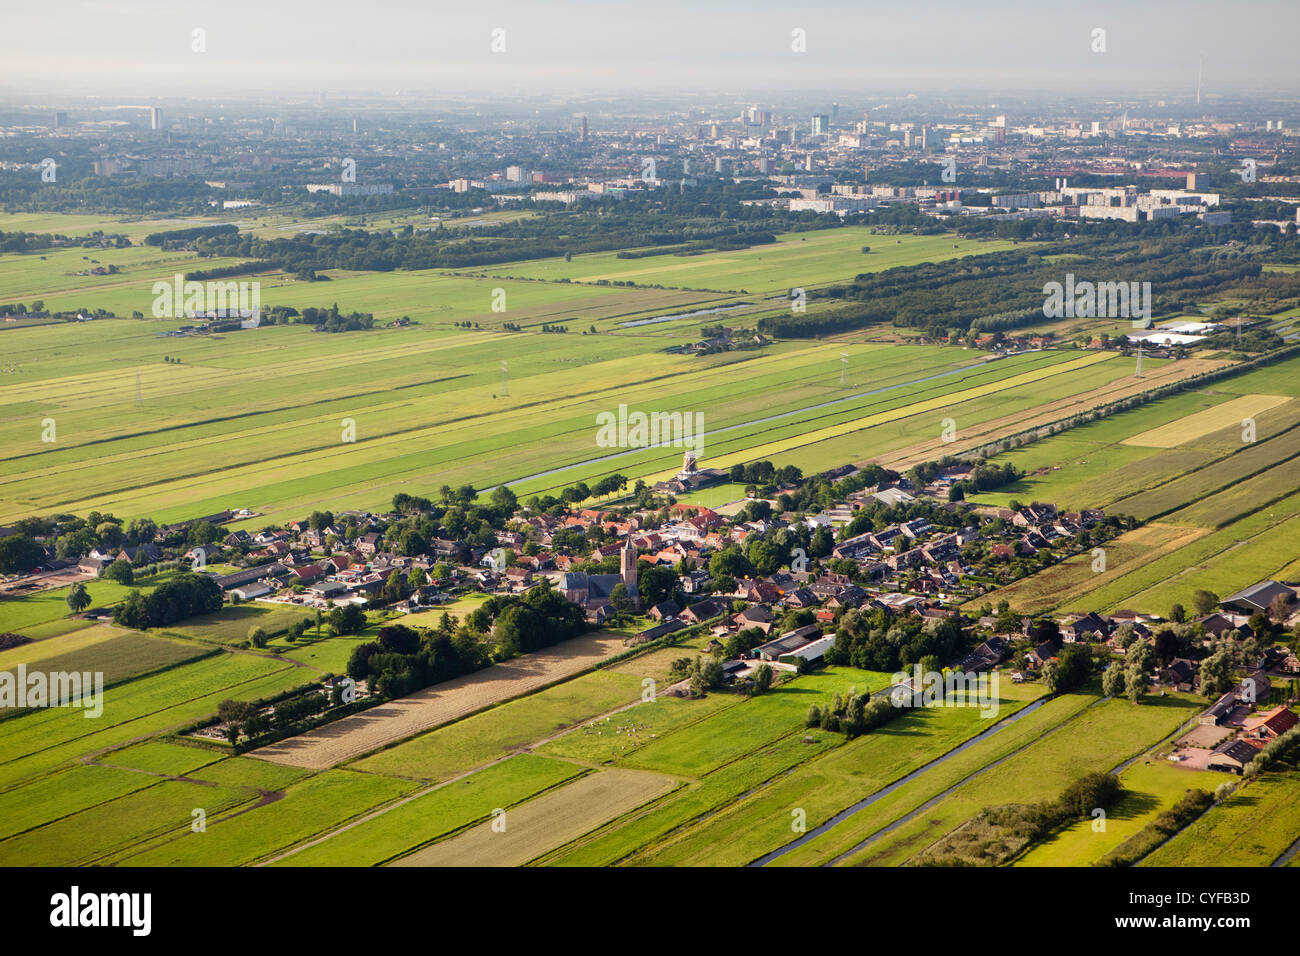 The Netherlands, Village of Westbroek, background the city of Utrecht. Aerial. - Stock Image